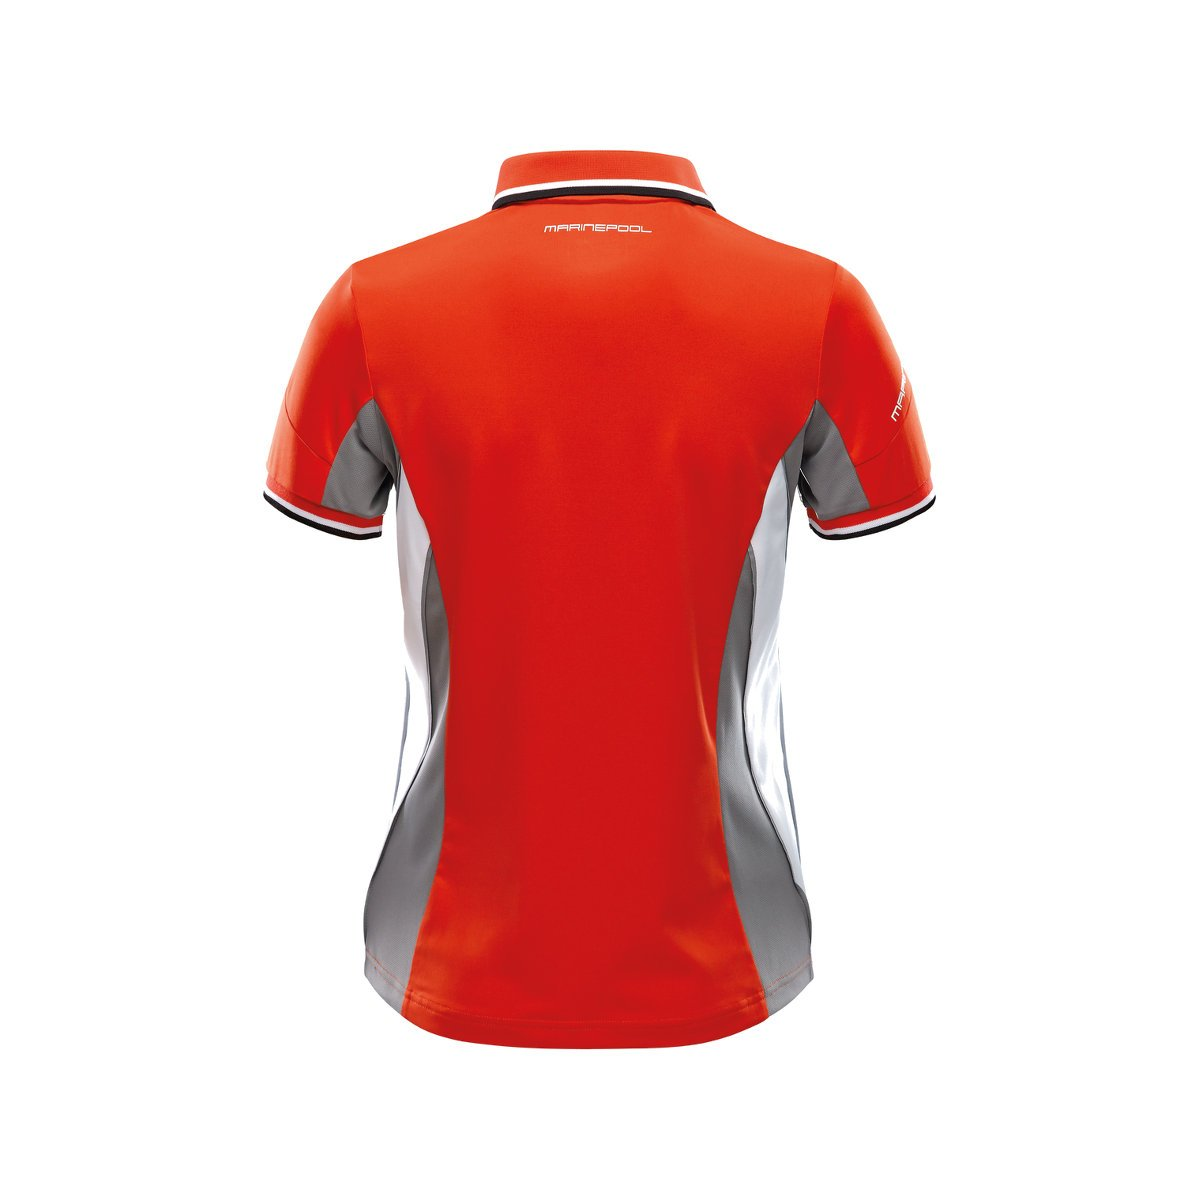 ef710fdb5360 Marinepool Madison Tec Poloshirt Damen orange, Größe M  Amazon.de  Sport    Freizeit